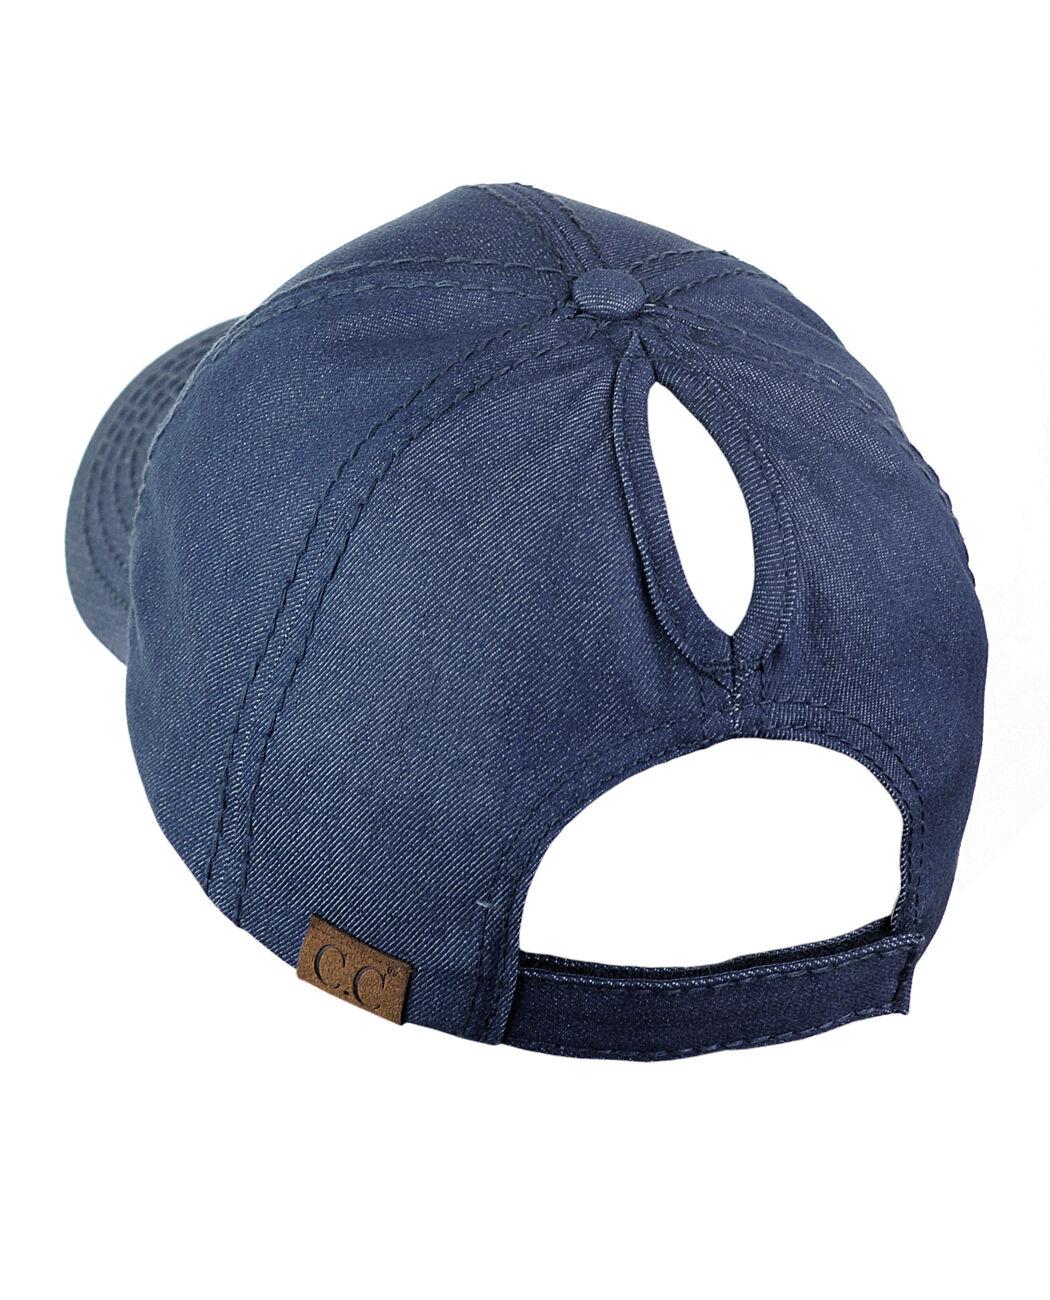 c79e09866d2 C.c Ponycap Messy High Bun Ponytail Adjustable Cotton Baseball Cap Hat Gray